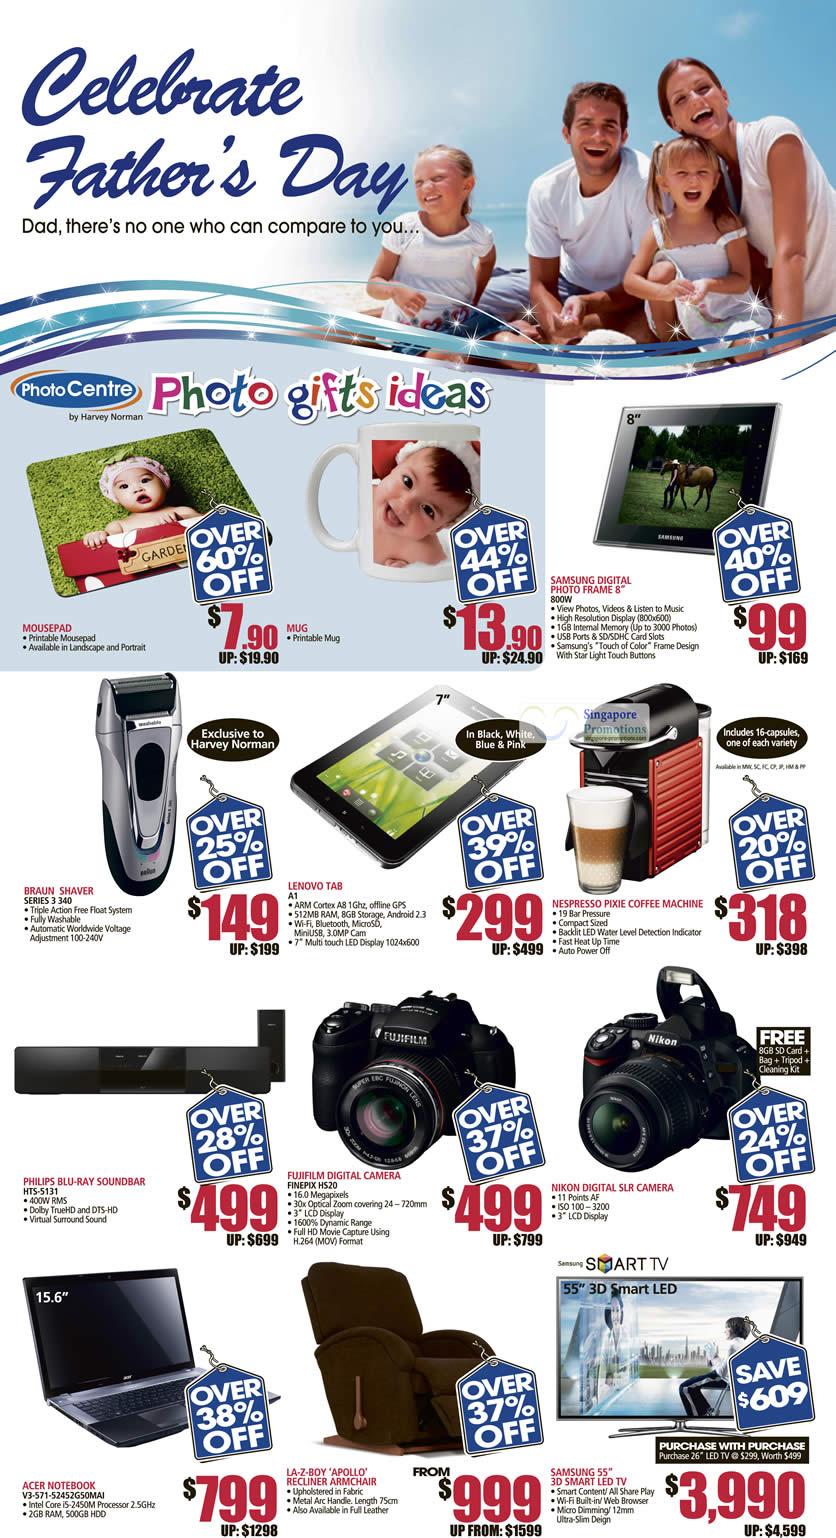 Fathers Day Photo Mug Mousepad Digital Photo Frame